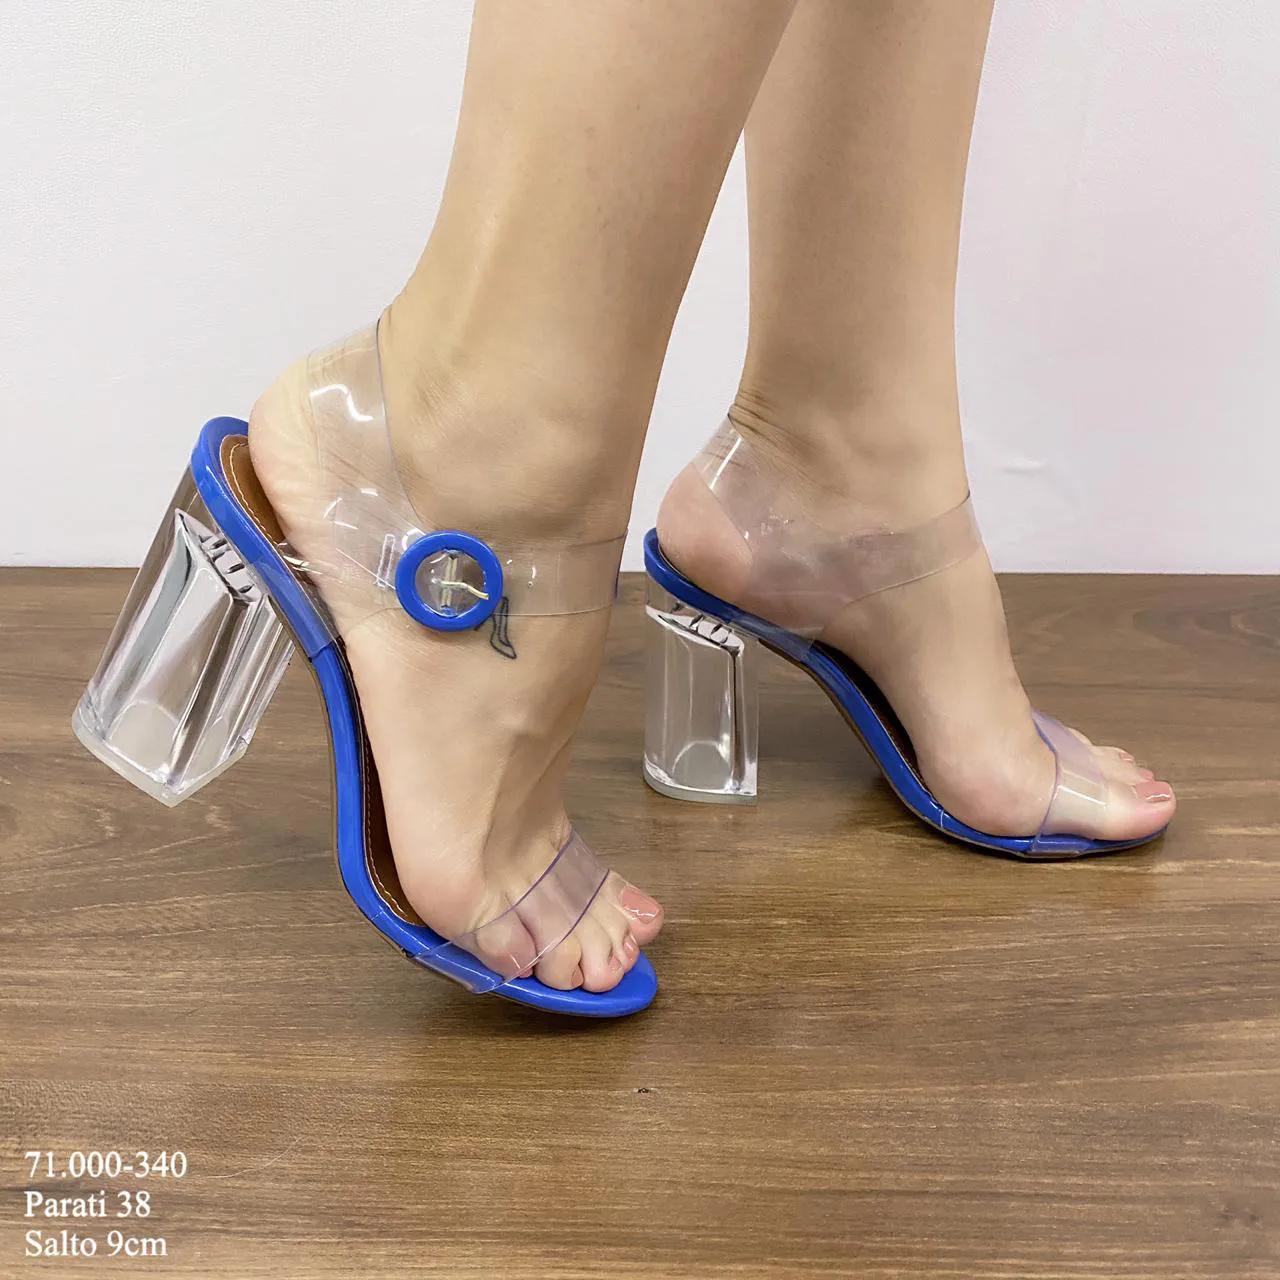 Sandália Azul Salto Cristal  | D-71.000-340